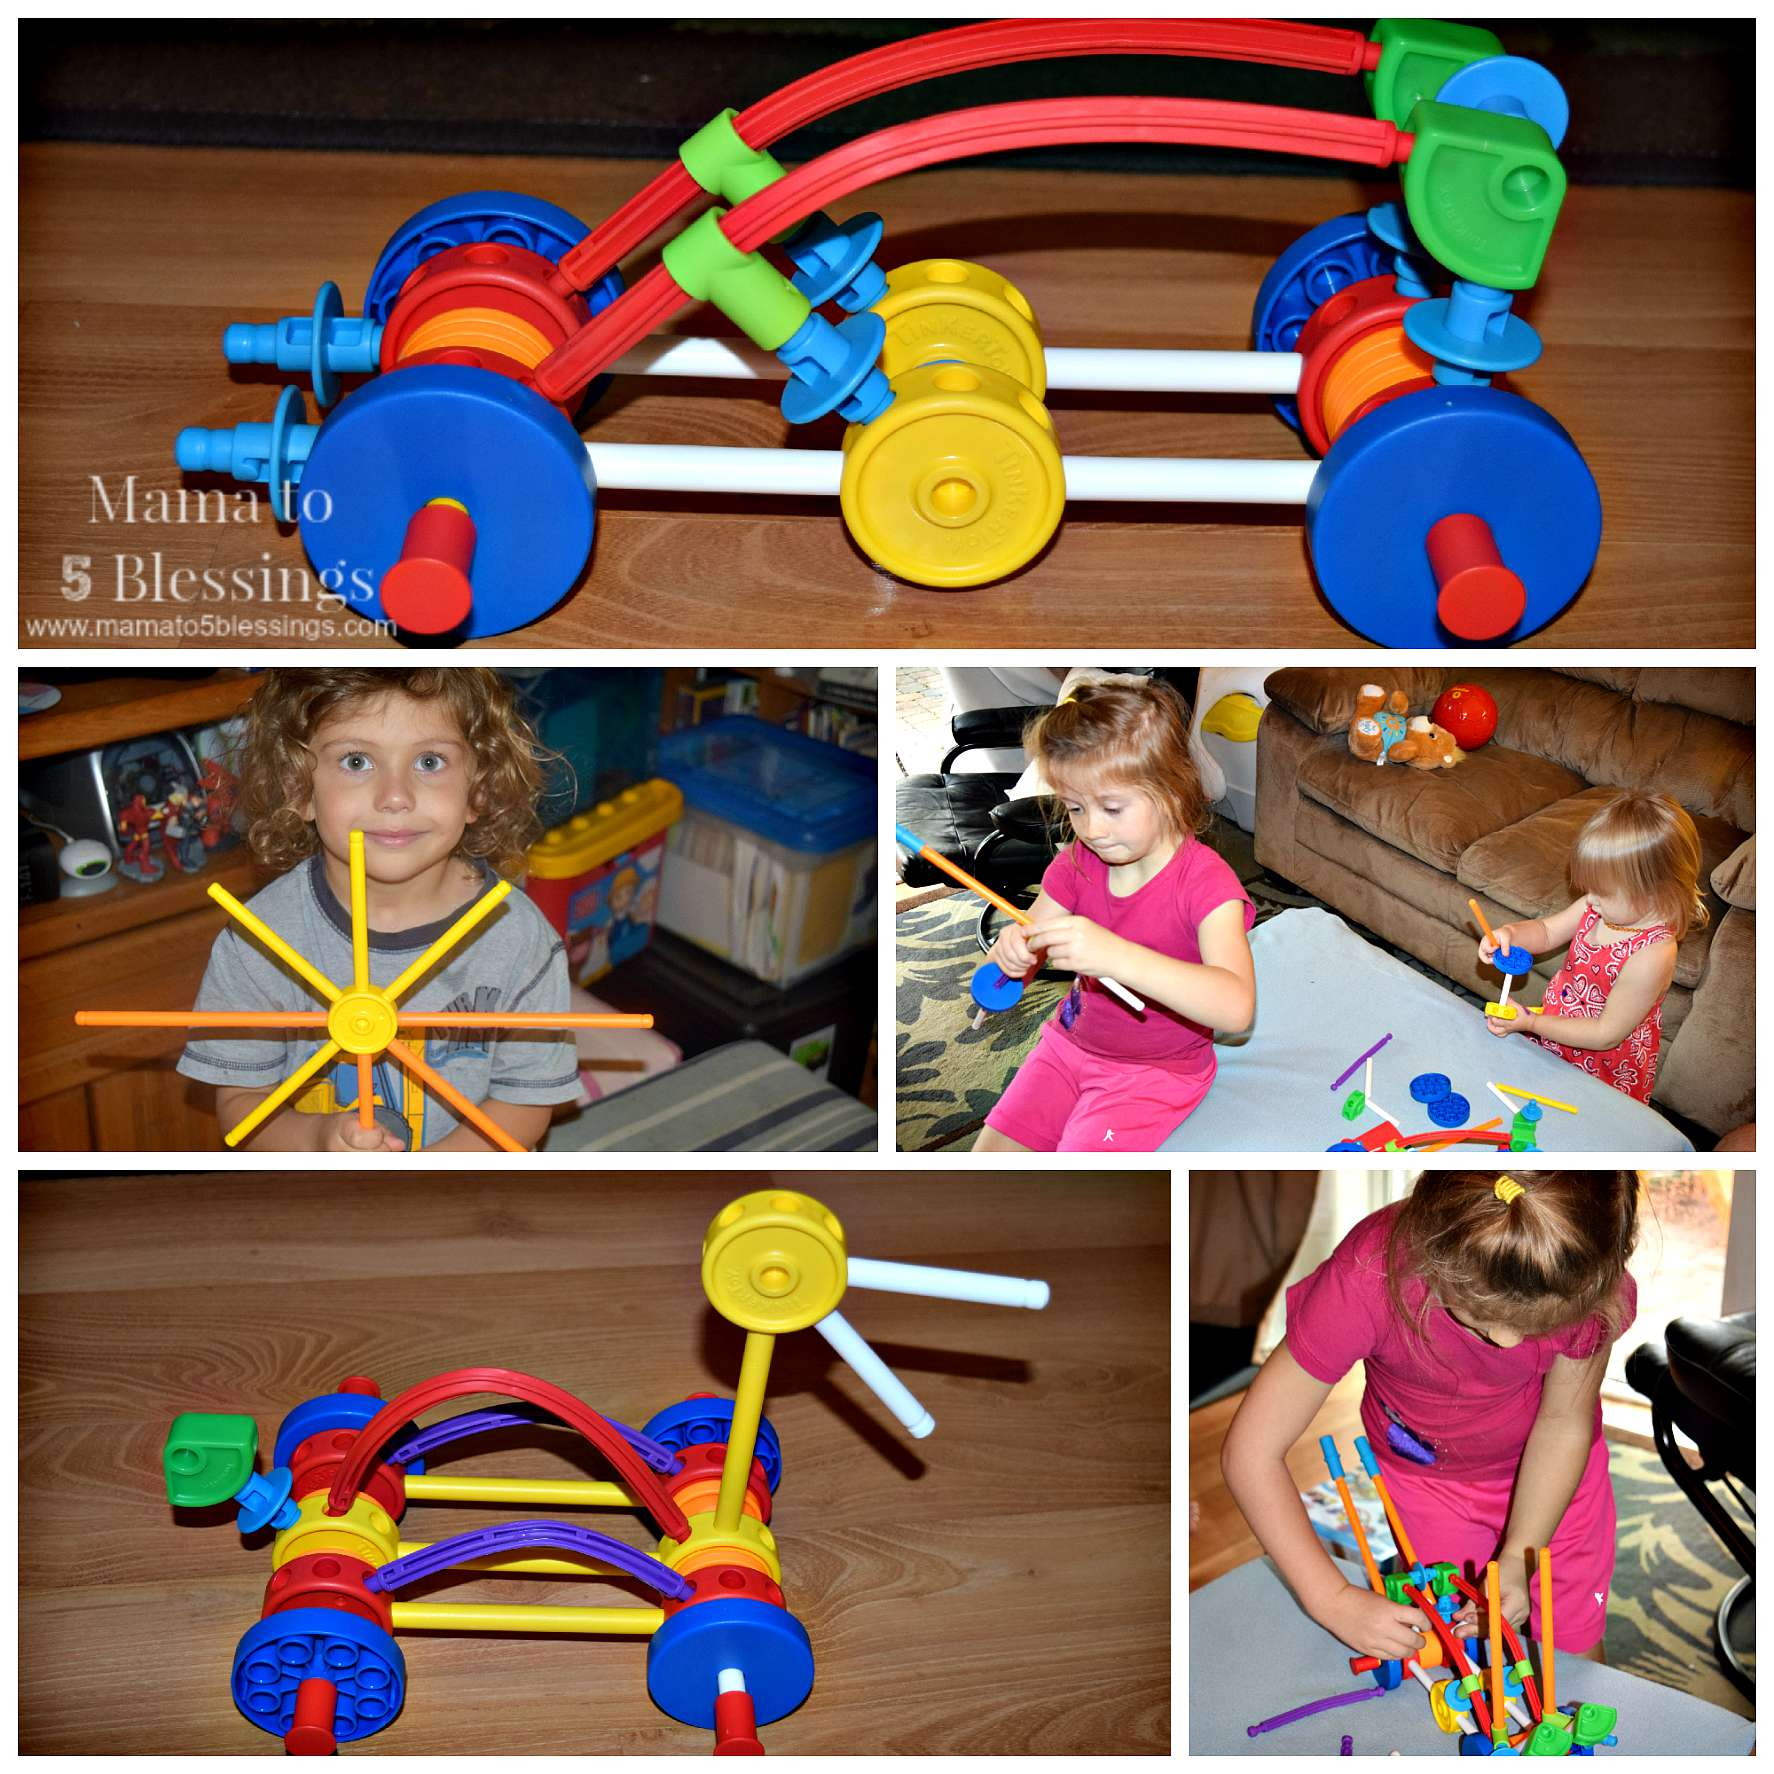 K'nex, Tinkertoy, Toy, Building, Build